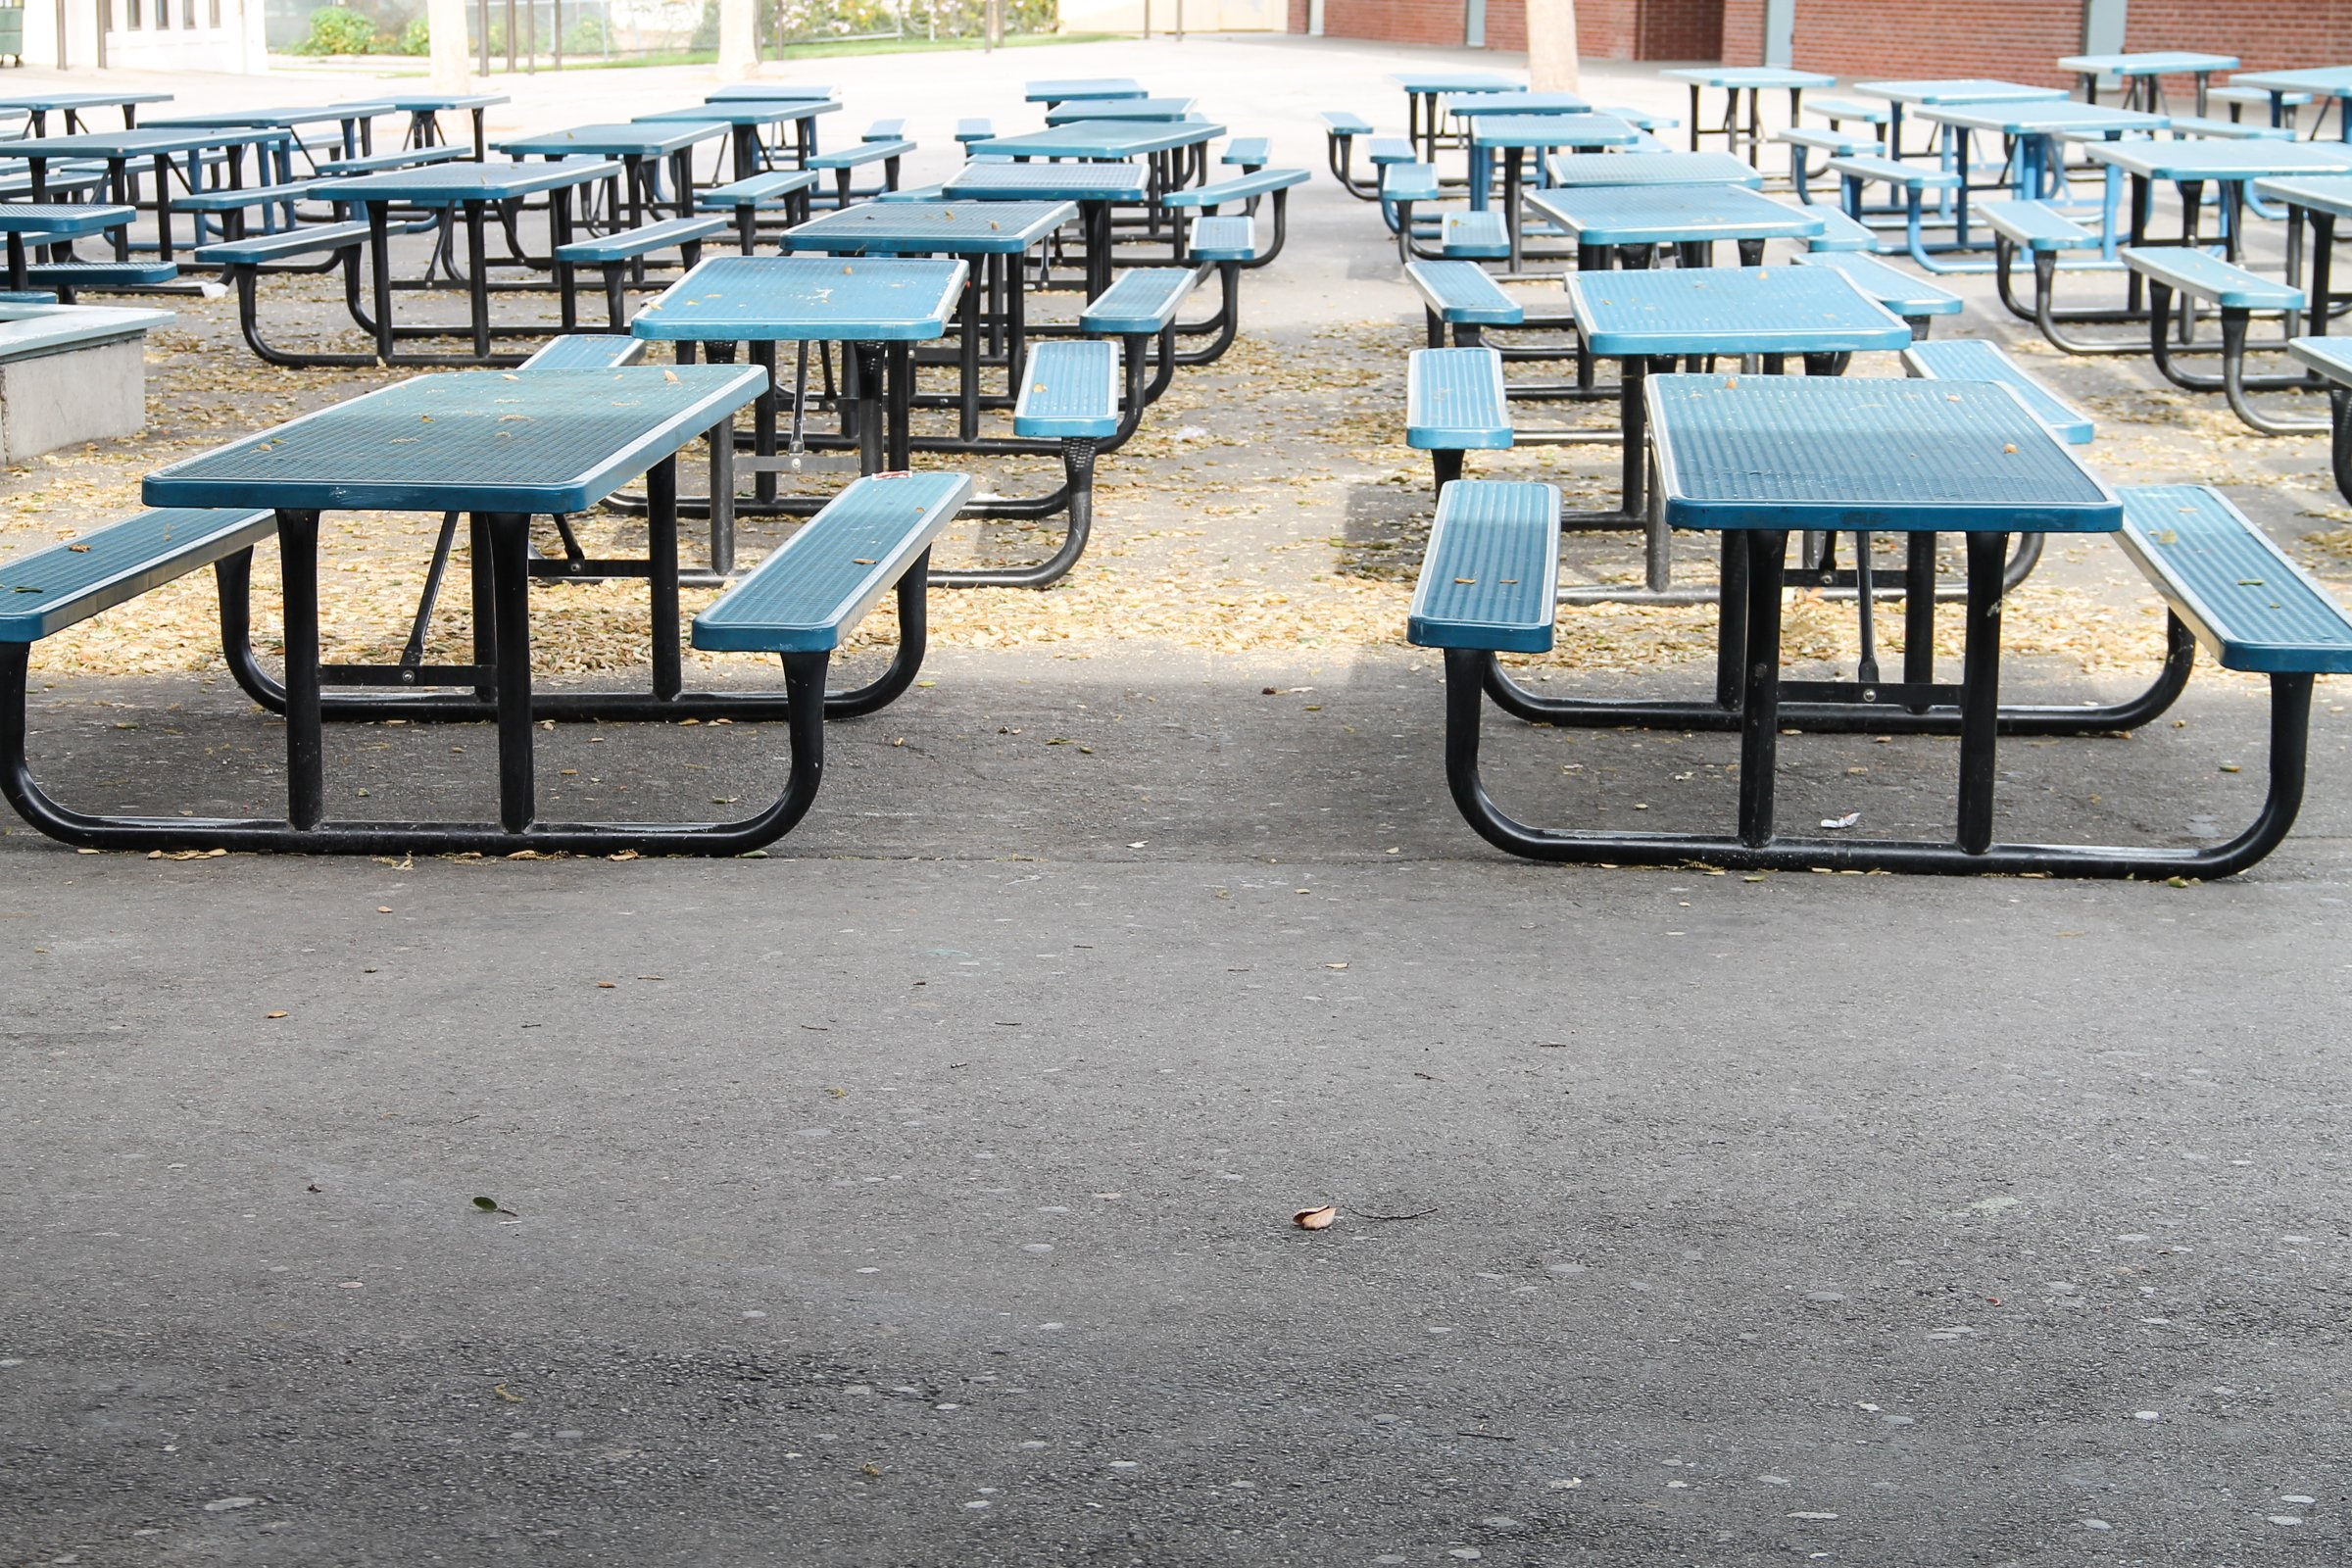 Outdoor school lunch tables